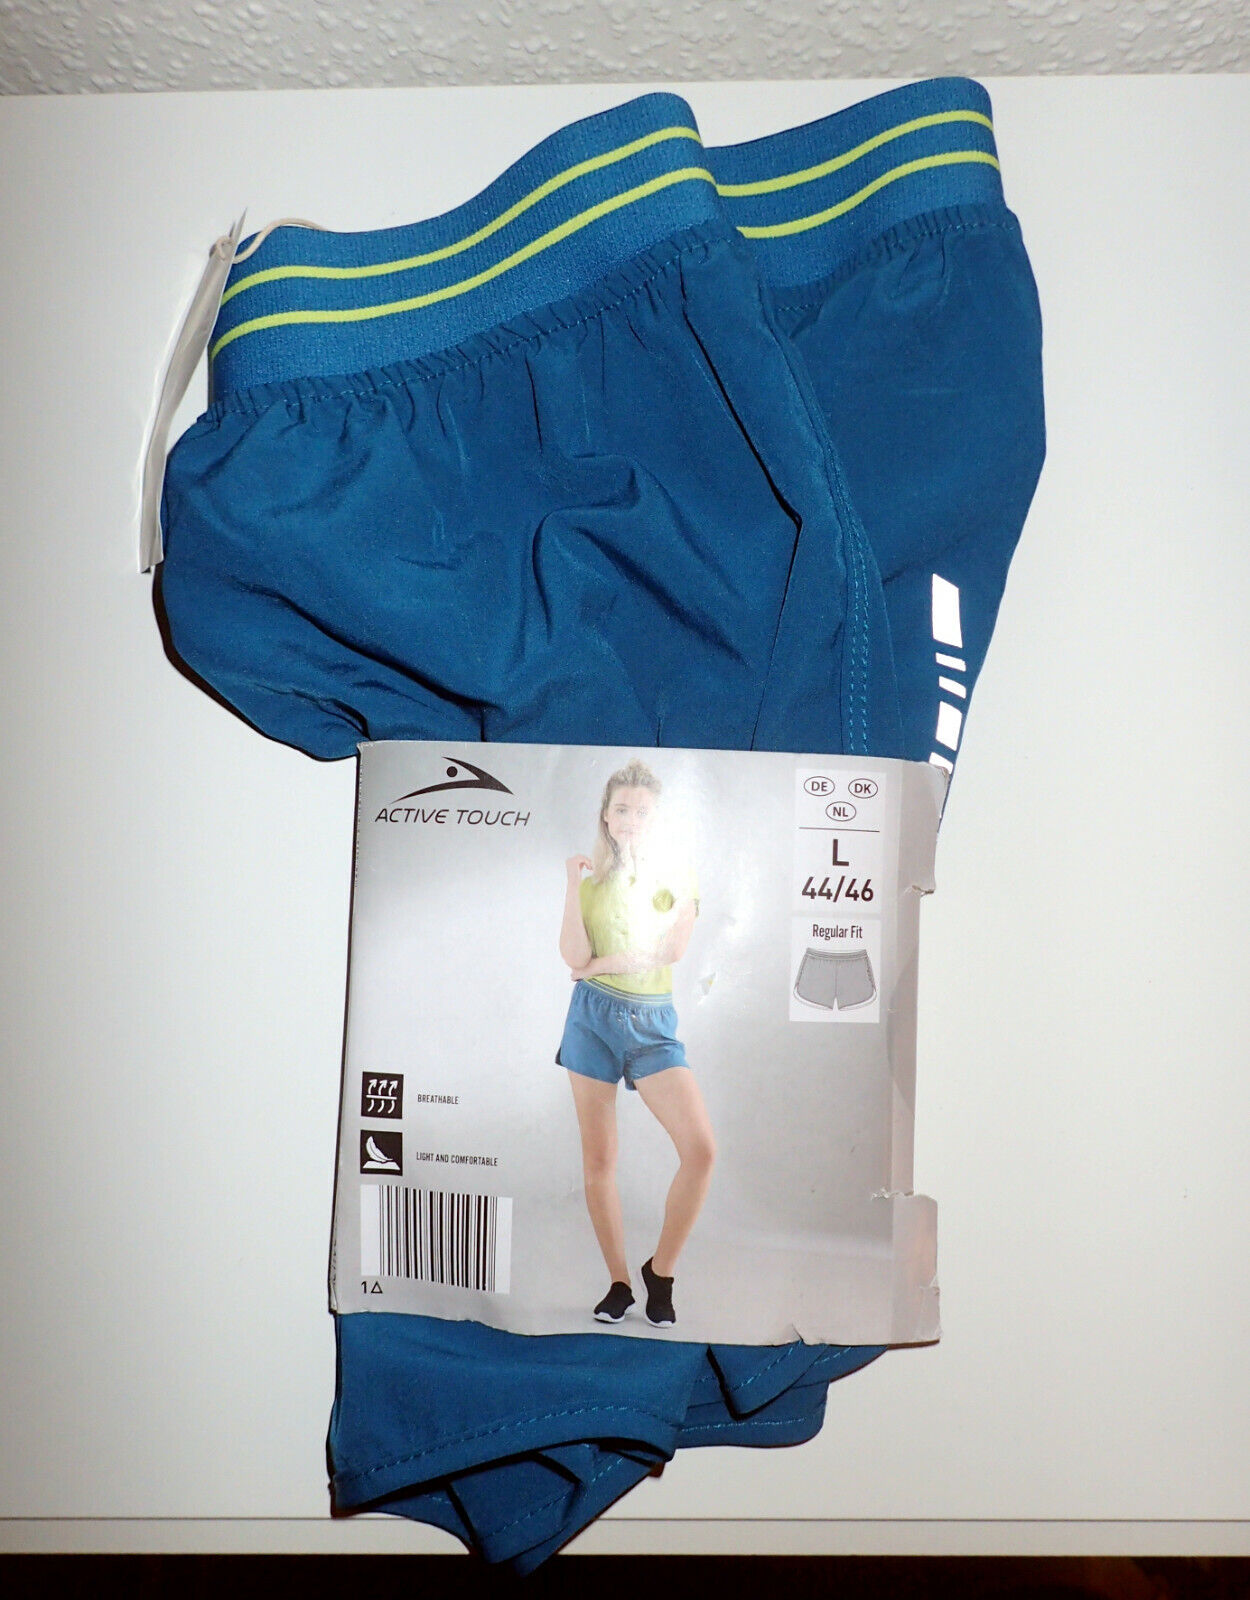 Active Touch, Damen Lauf-Shorts, blau/petrol, Gr. S (36/38), neu!